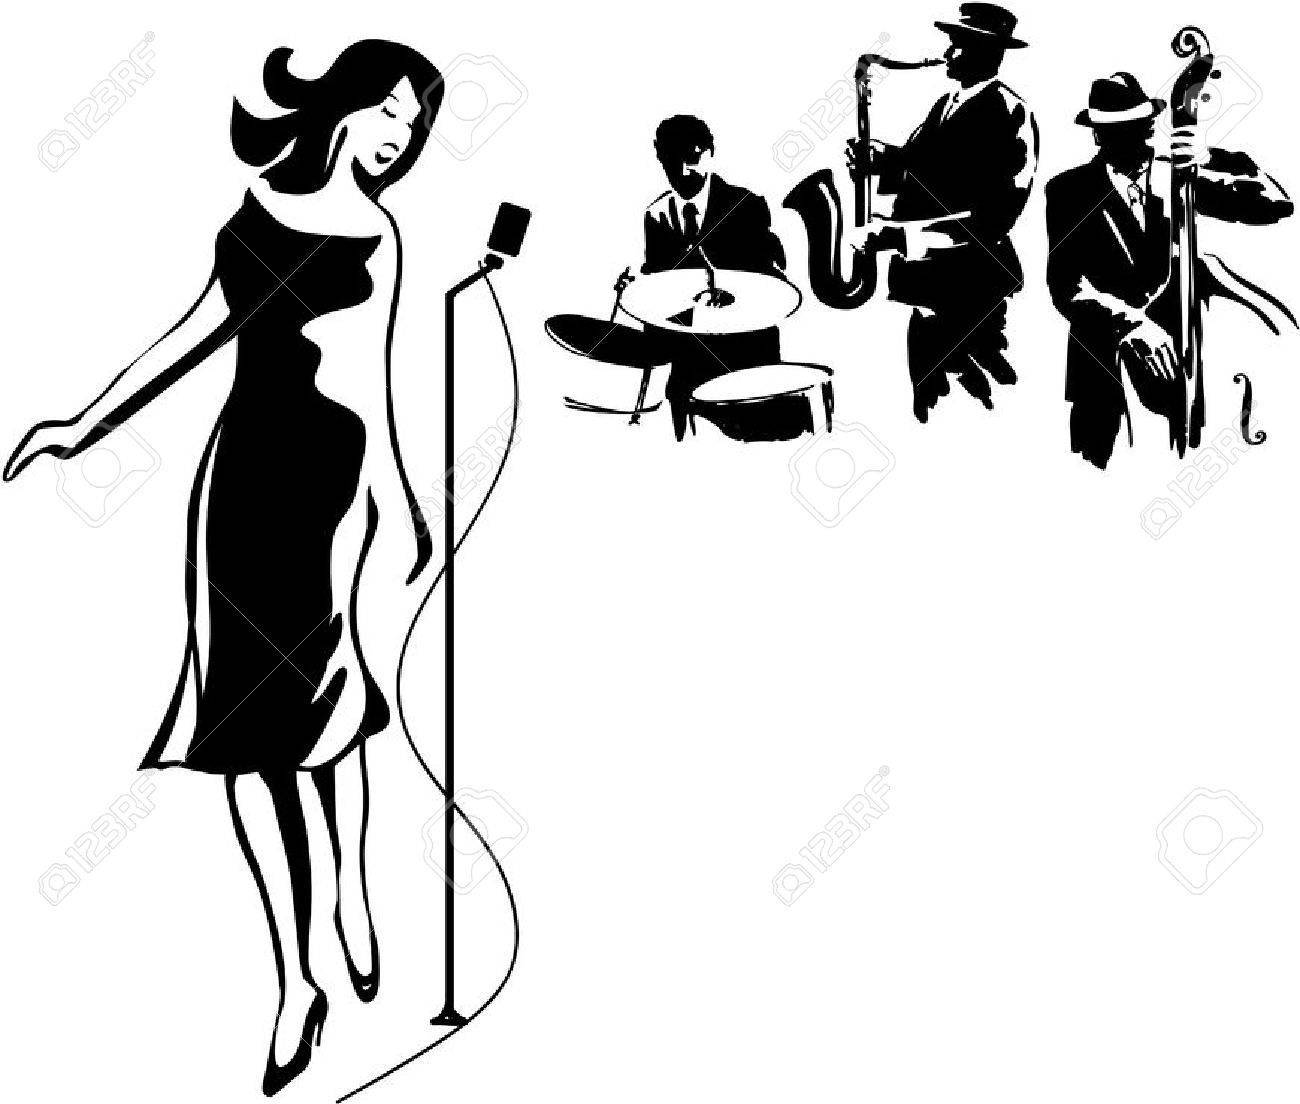 singer silhouette at getdrawings com free for personal use singer rh getdrawings com